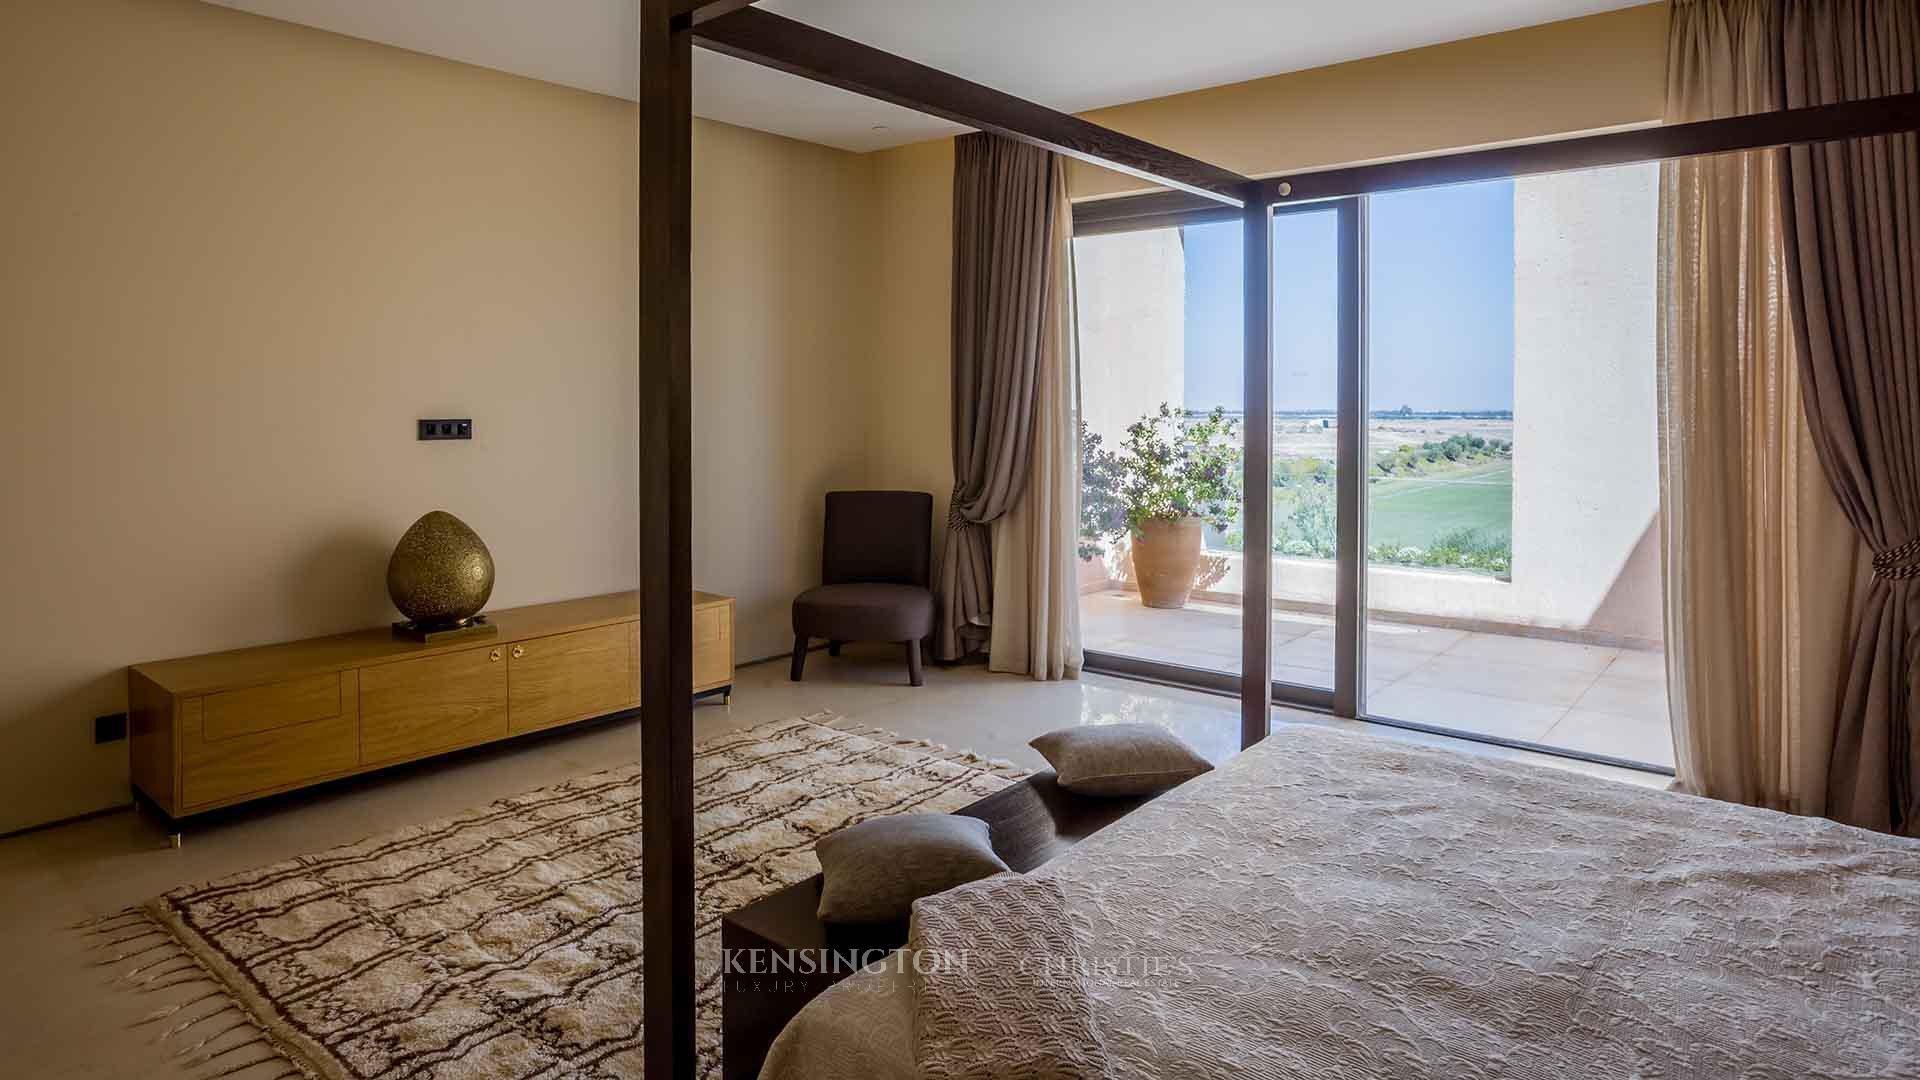 KPPM01015: Jnan Amar - Ritz Carlton Residences Luxury Villa Marrakech Morocco